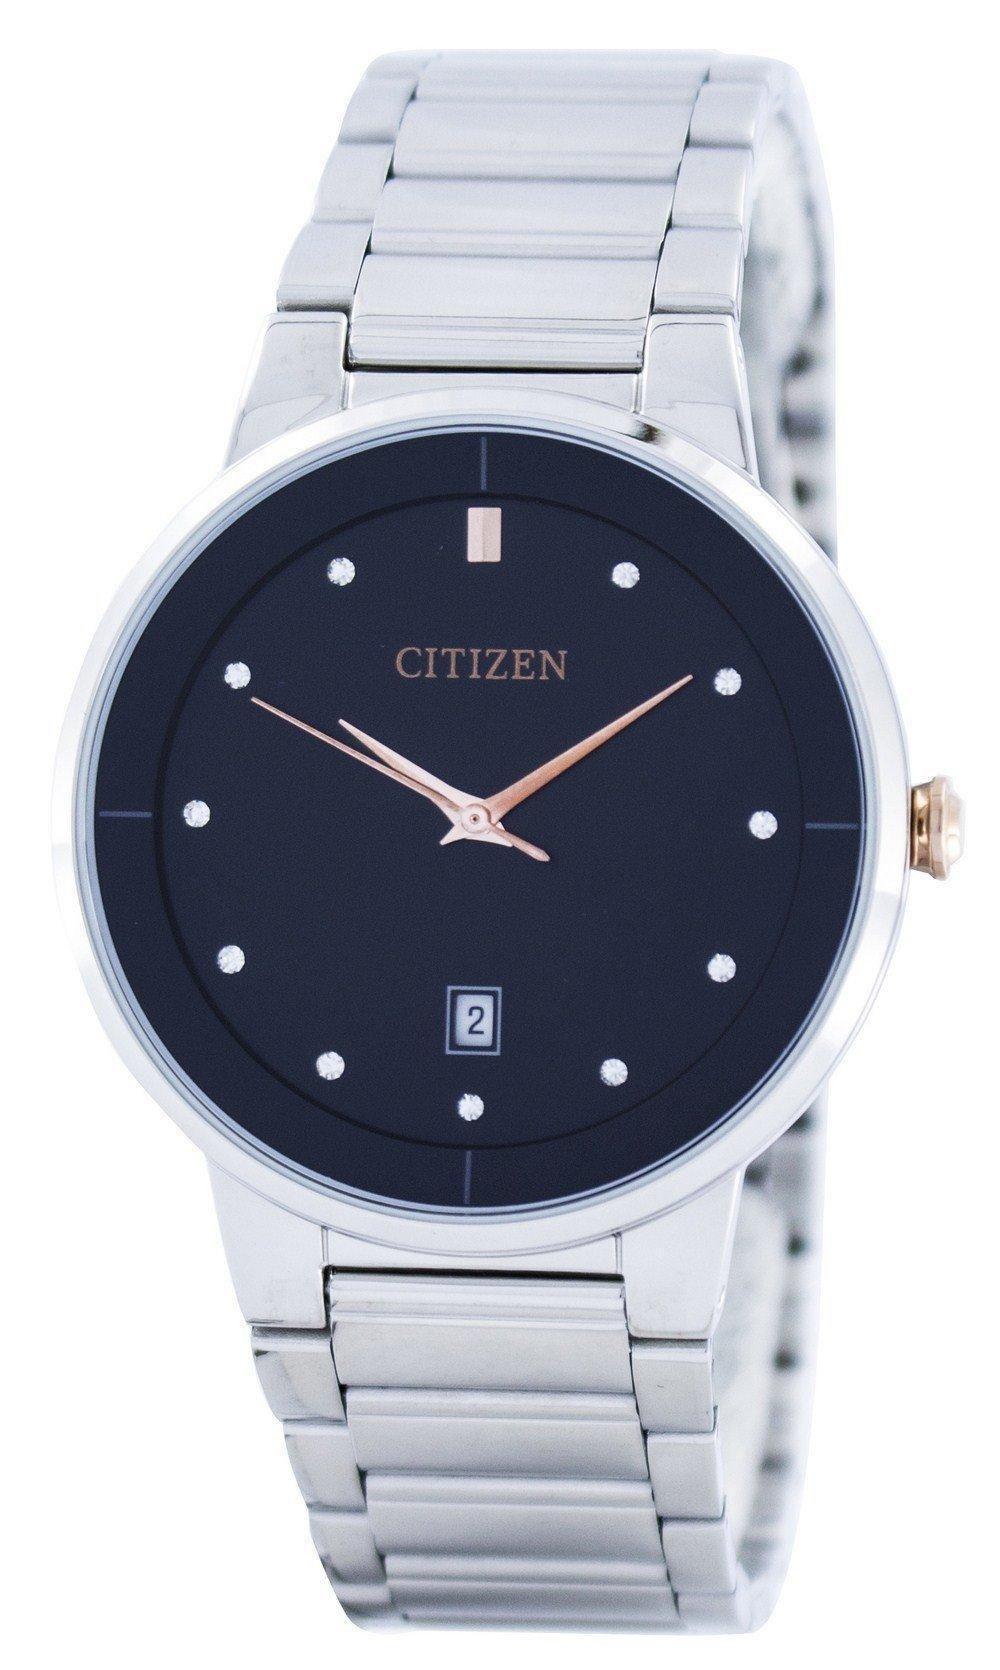 381ec45afe39 Citizen Quartz Diamond Accent Black Dial Bi5014-58e Men s Watch (FREE  Shipping)